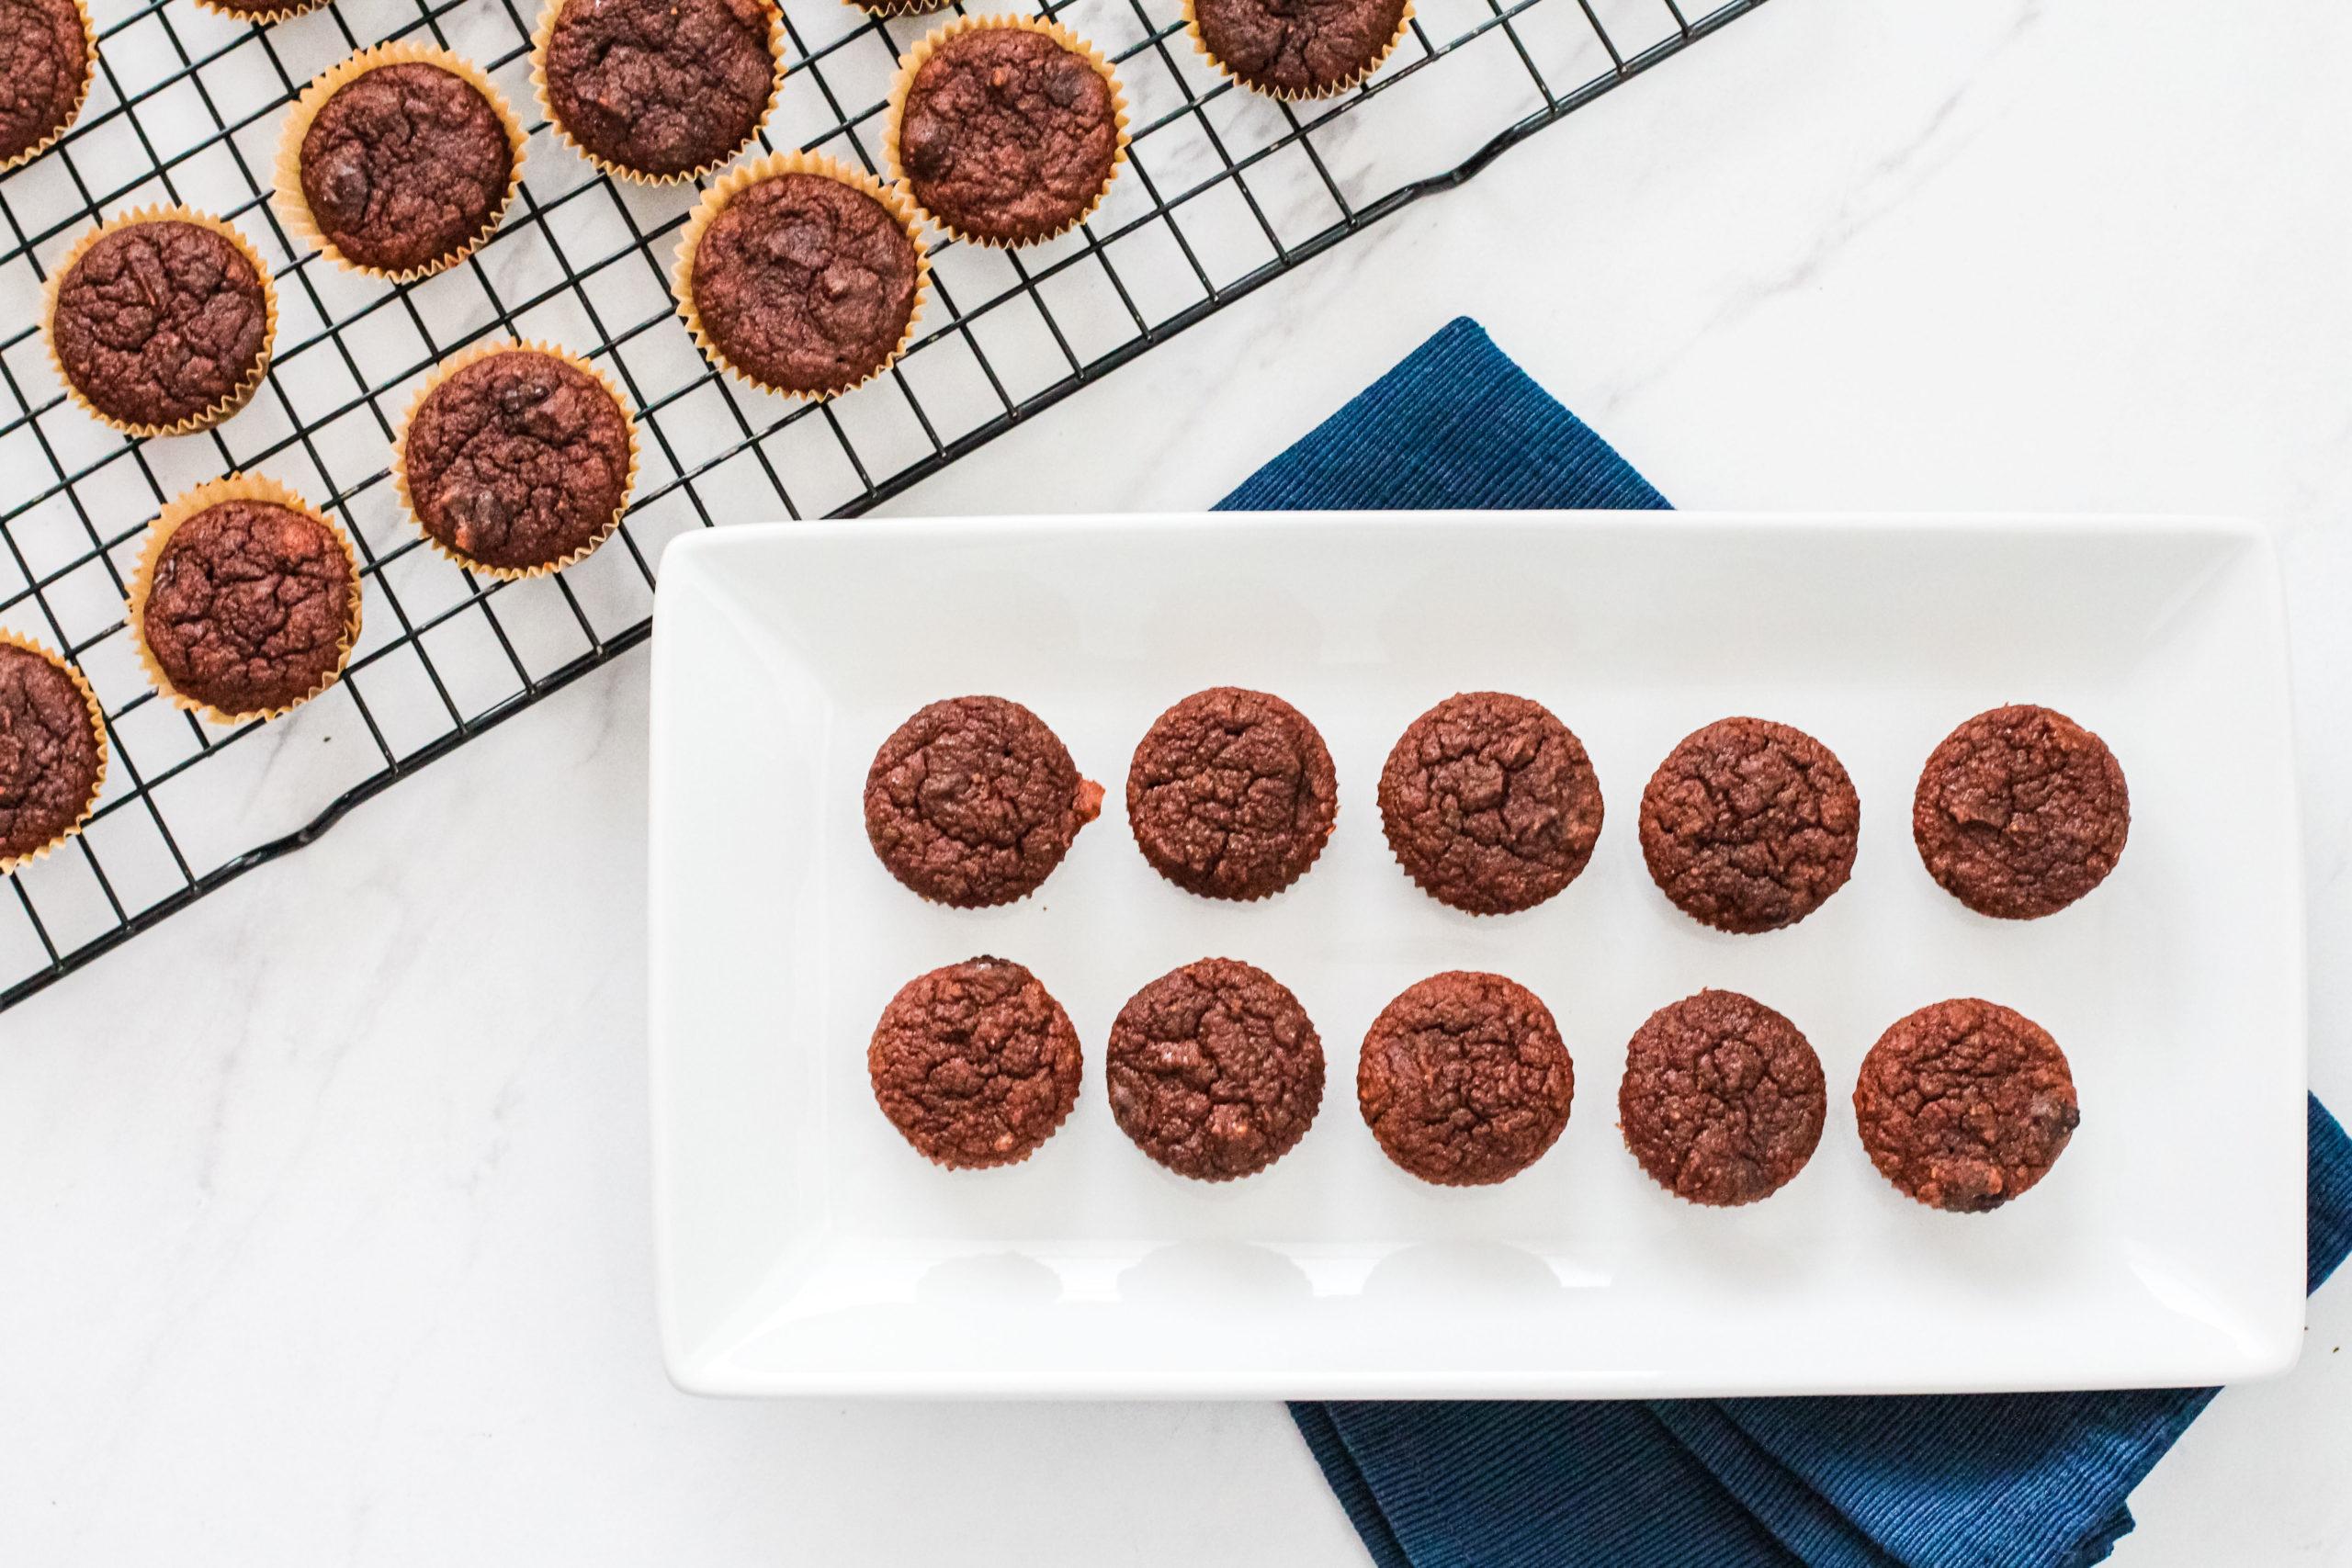 Healthy Chocolate Banana Muffins